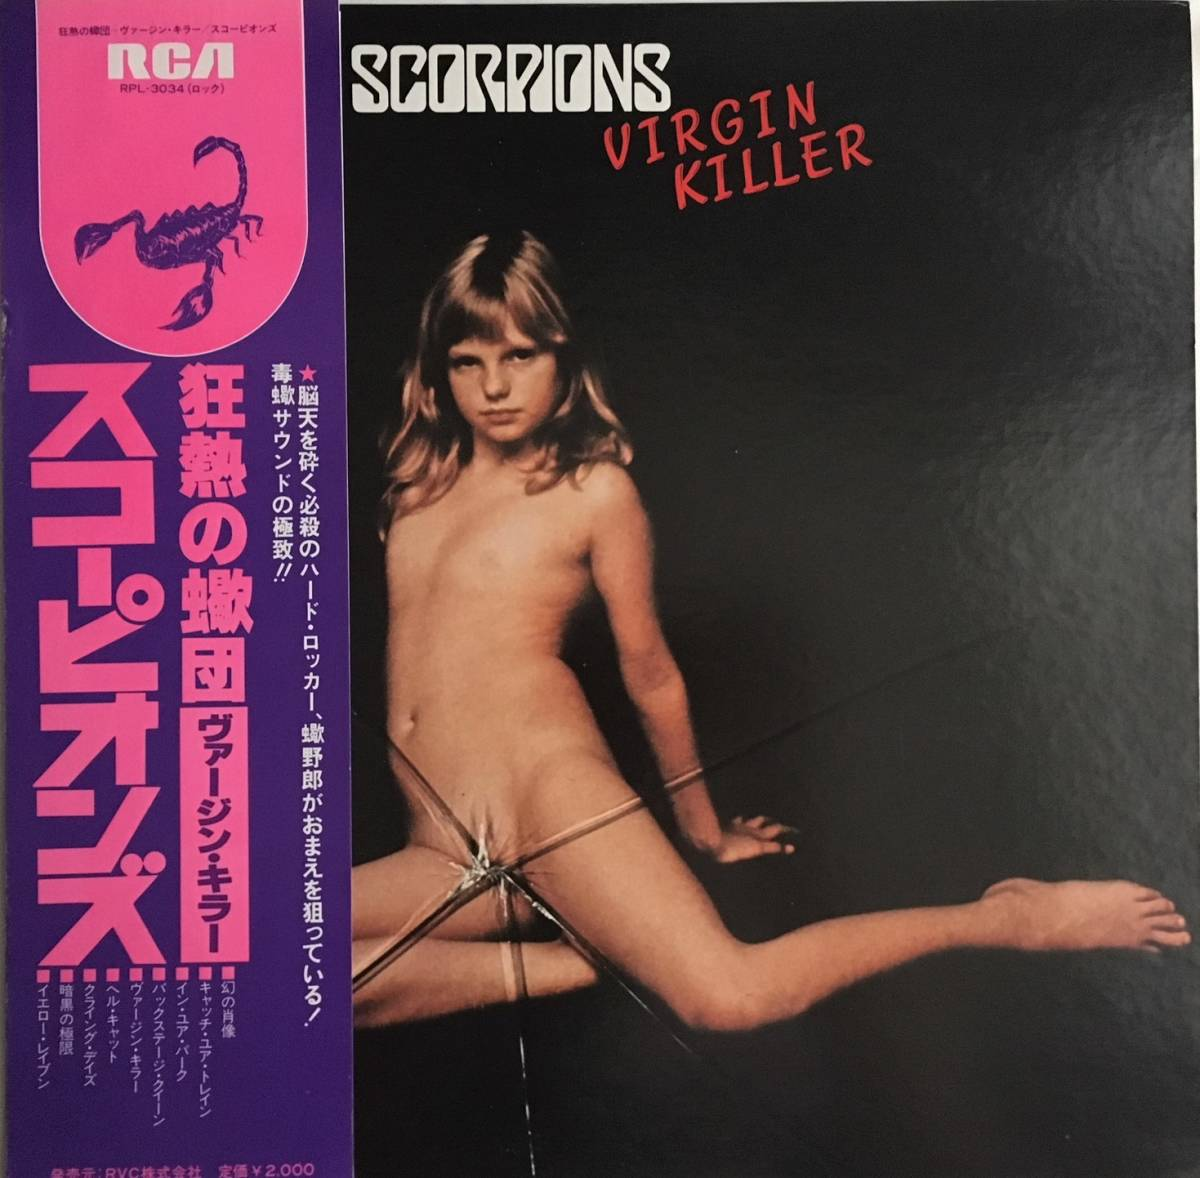 ☆☆【LPレコード】スコーピオンズ SCORPIONS VIRGIN KILLER ★★_画像1